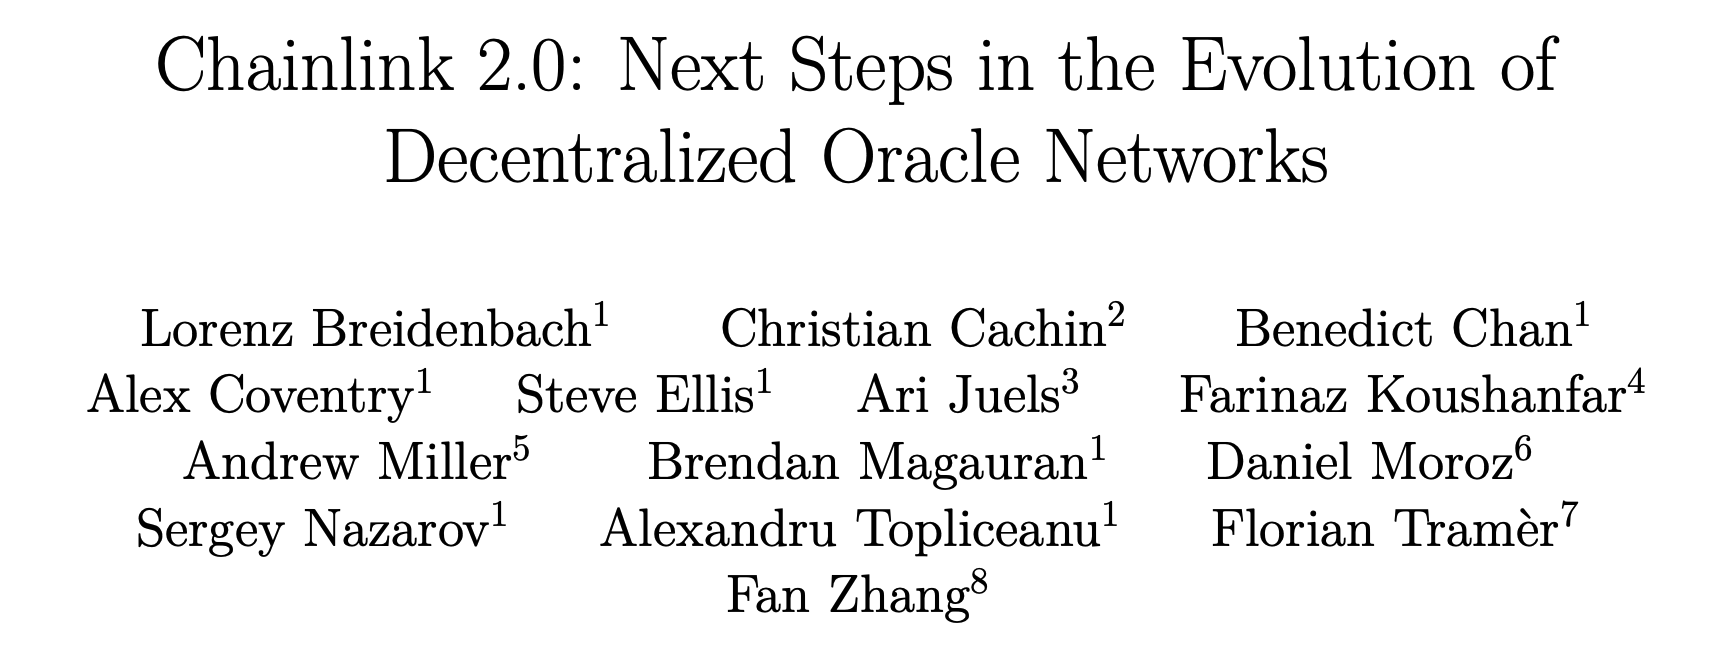 Chainlink 2.0 白皮书问题出在哪?